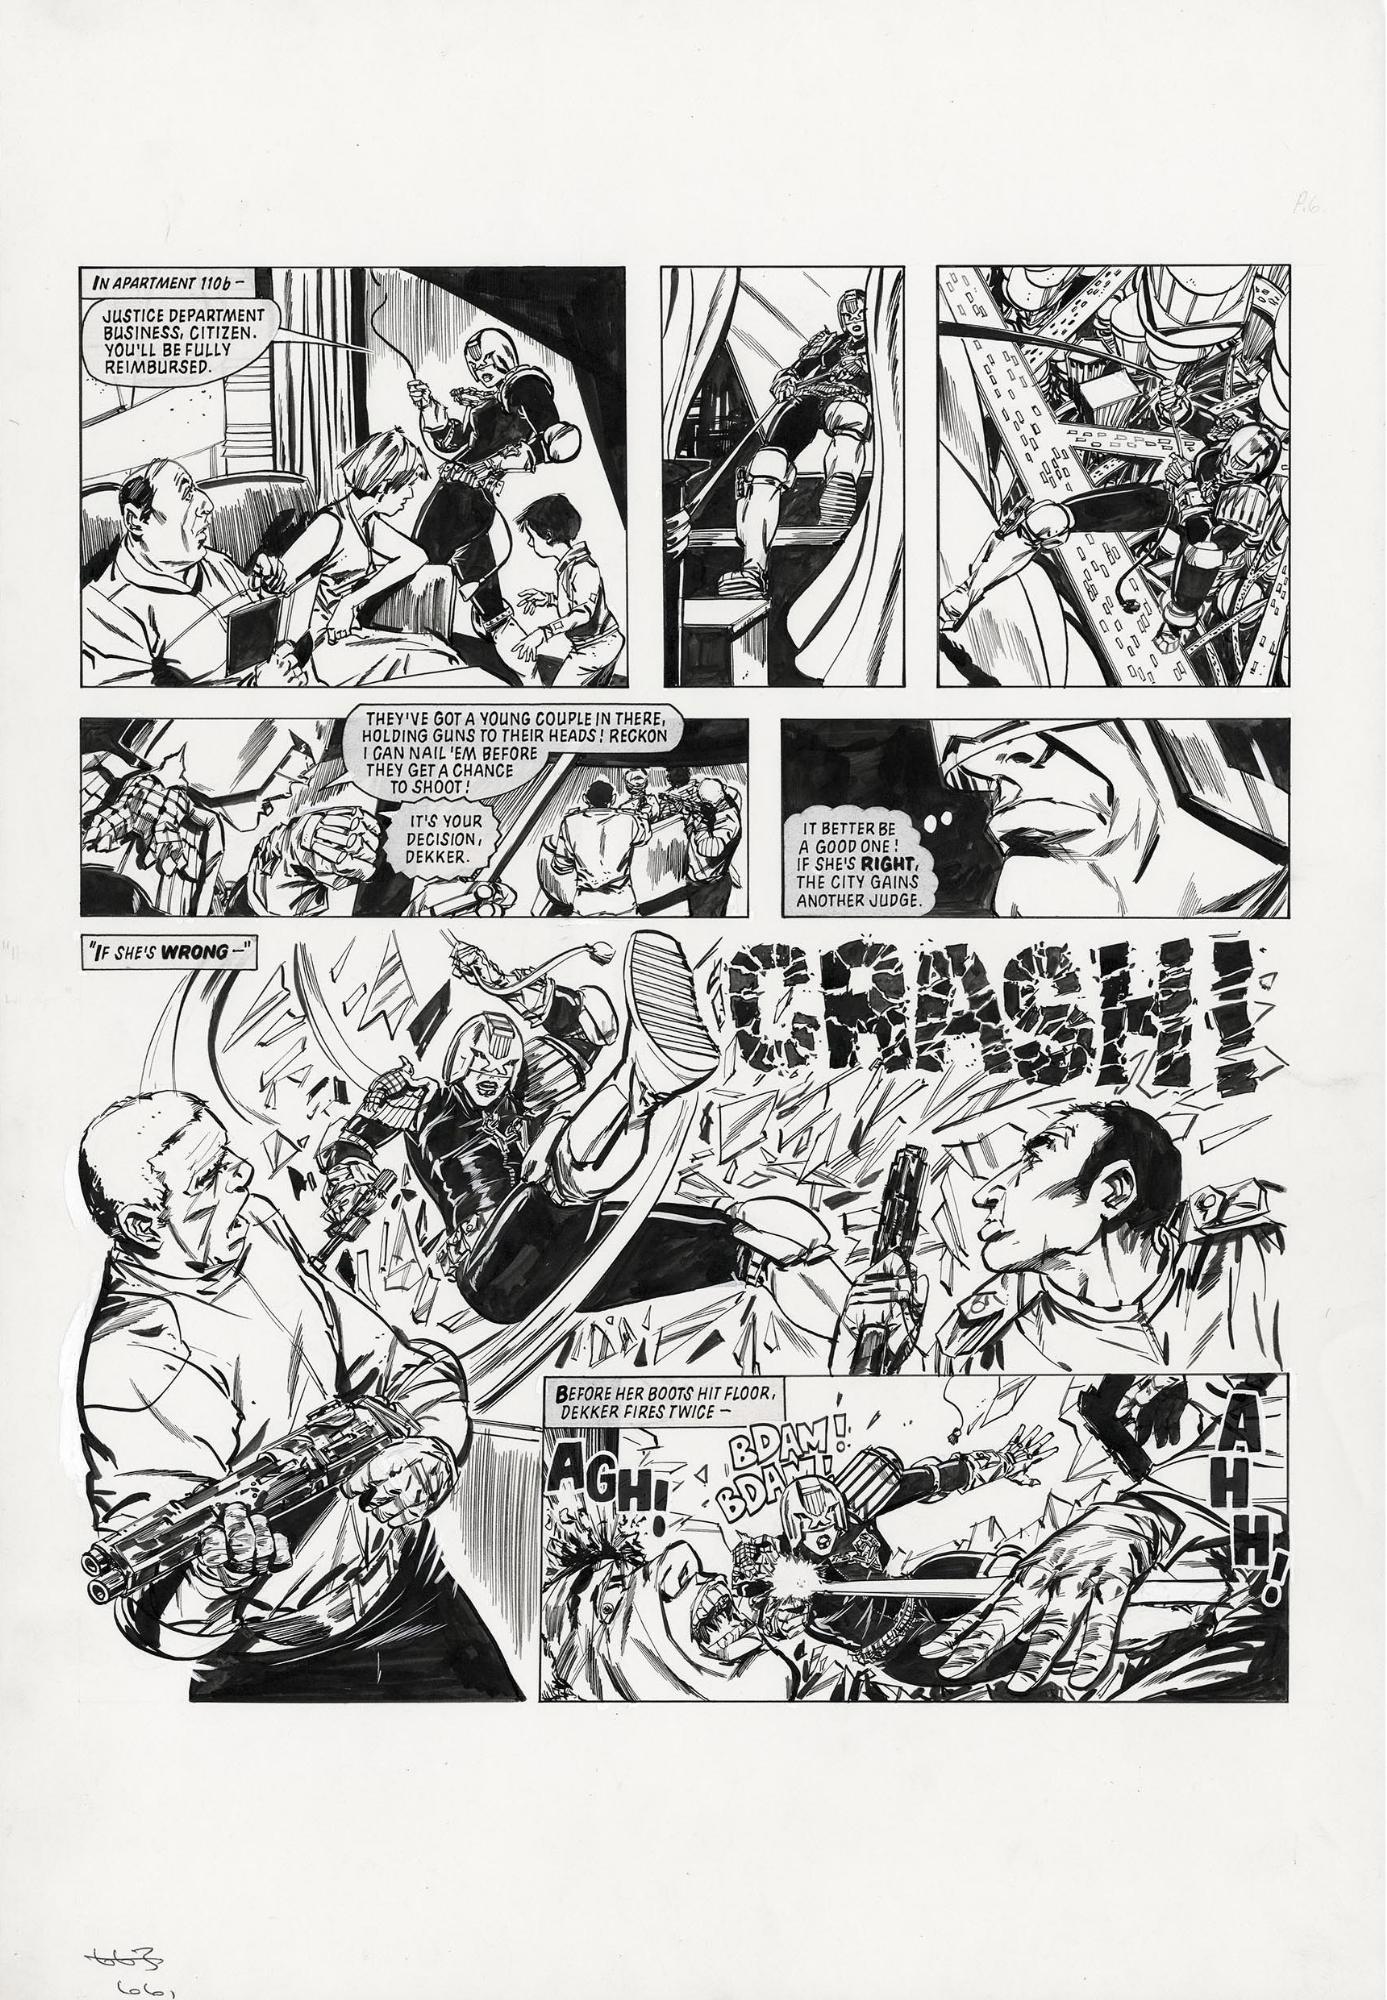 2000AD - Judge Dredd: The Making of a Judge pg 6 (Kim Raymond), in